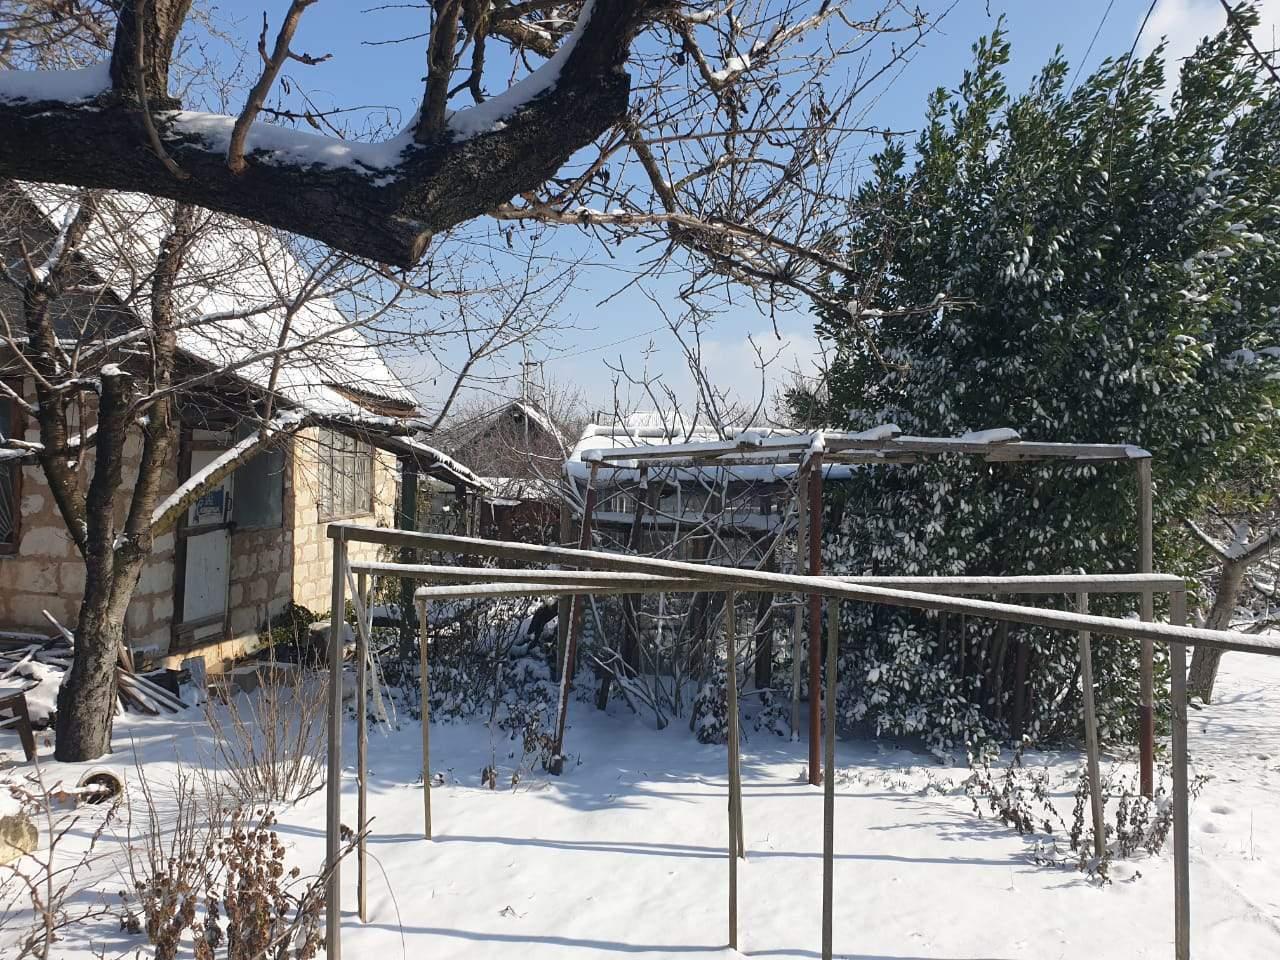 Продажа дома, 25м <sup>2</sup>, 4 сот., Саки, Севастопольский переулок